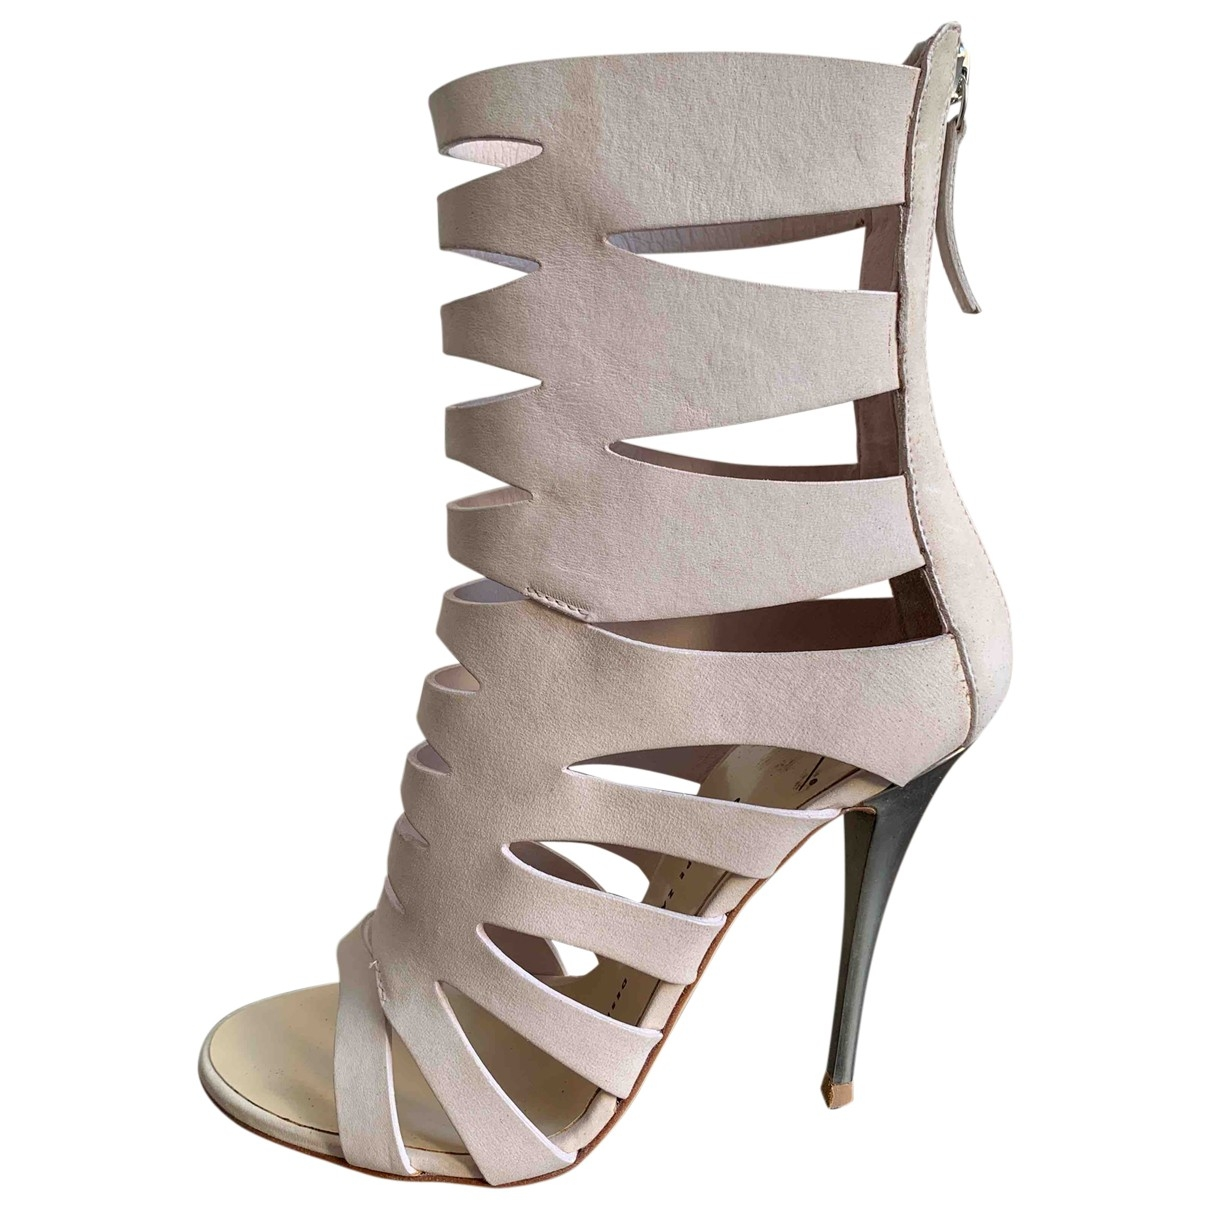 Giuseppe Zanotti \N Pink Suede Sandals for Women 37 EU